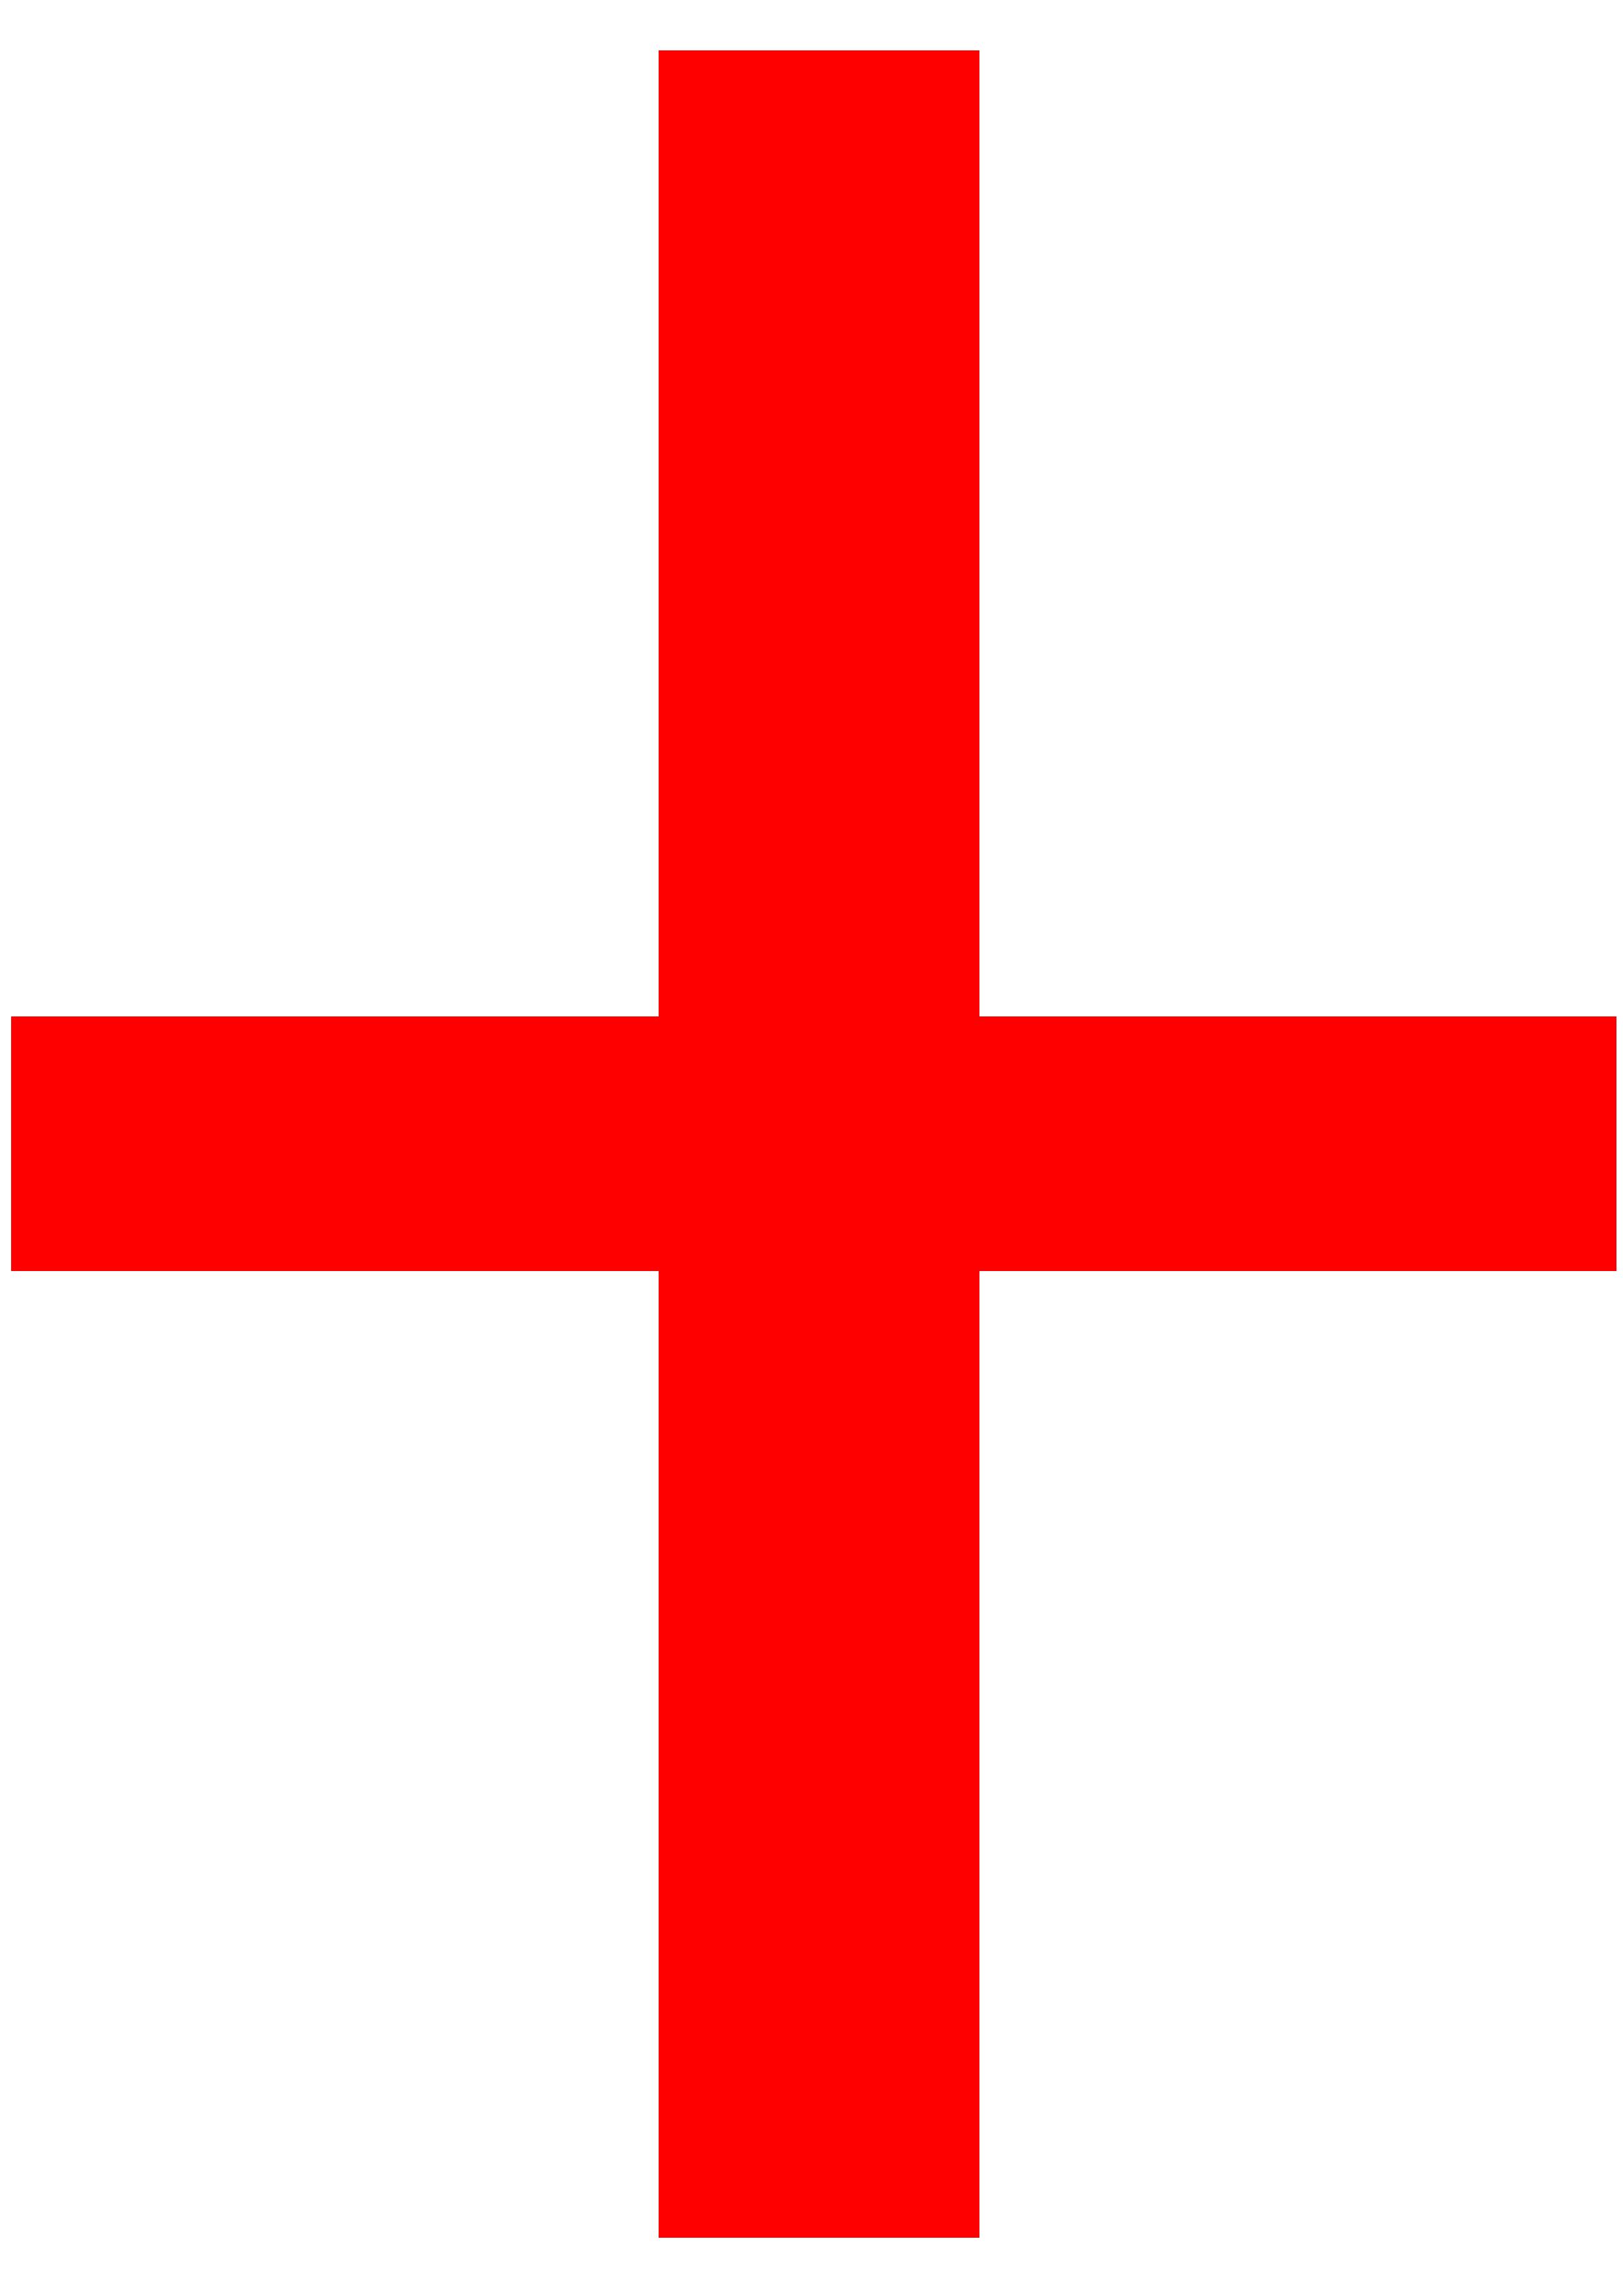 photo relating to Printable England Flag named England Flag - No cost Printable England Flag ENGLAND For good